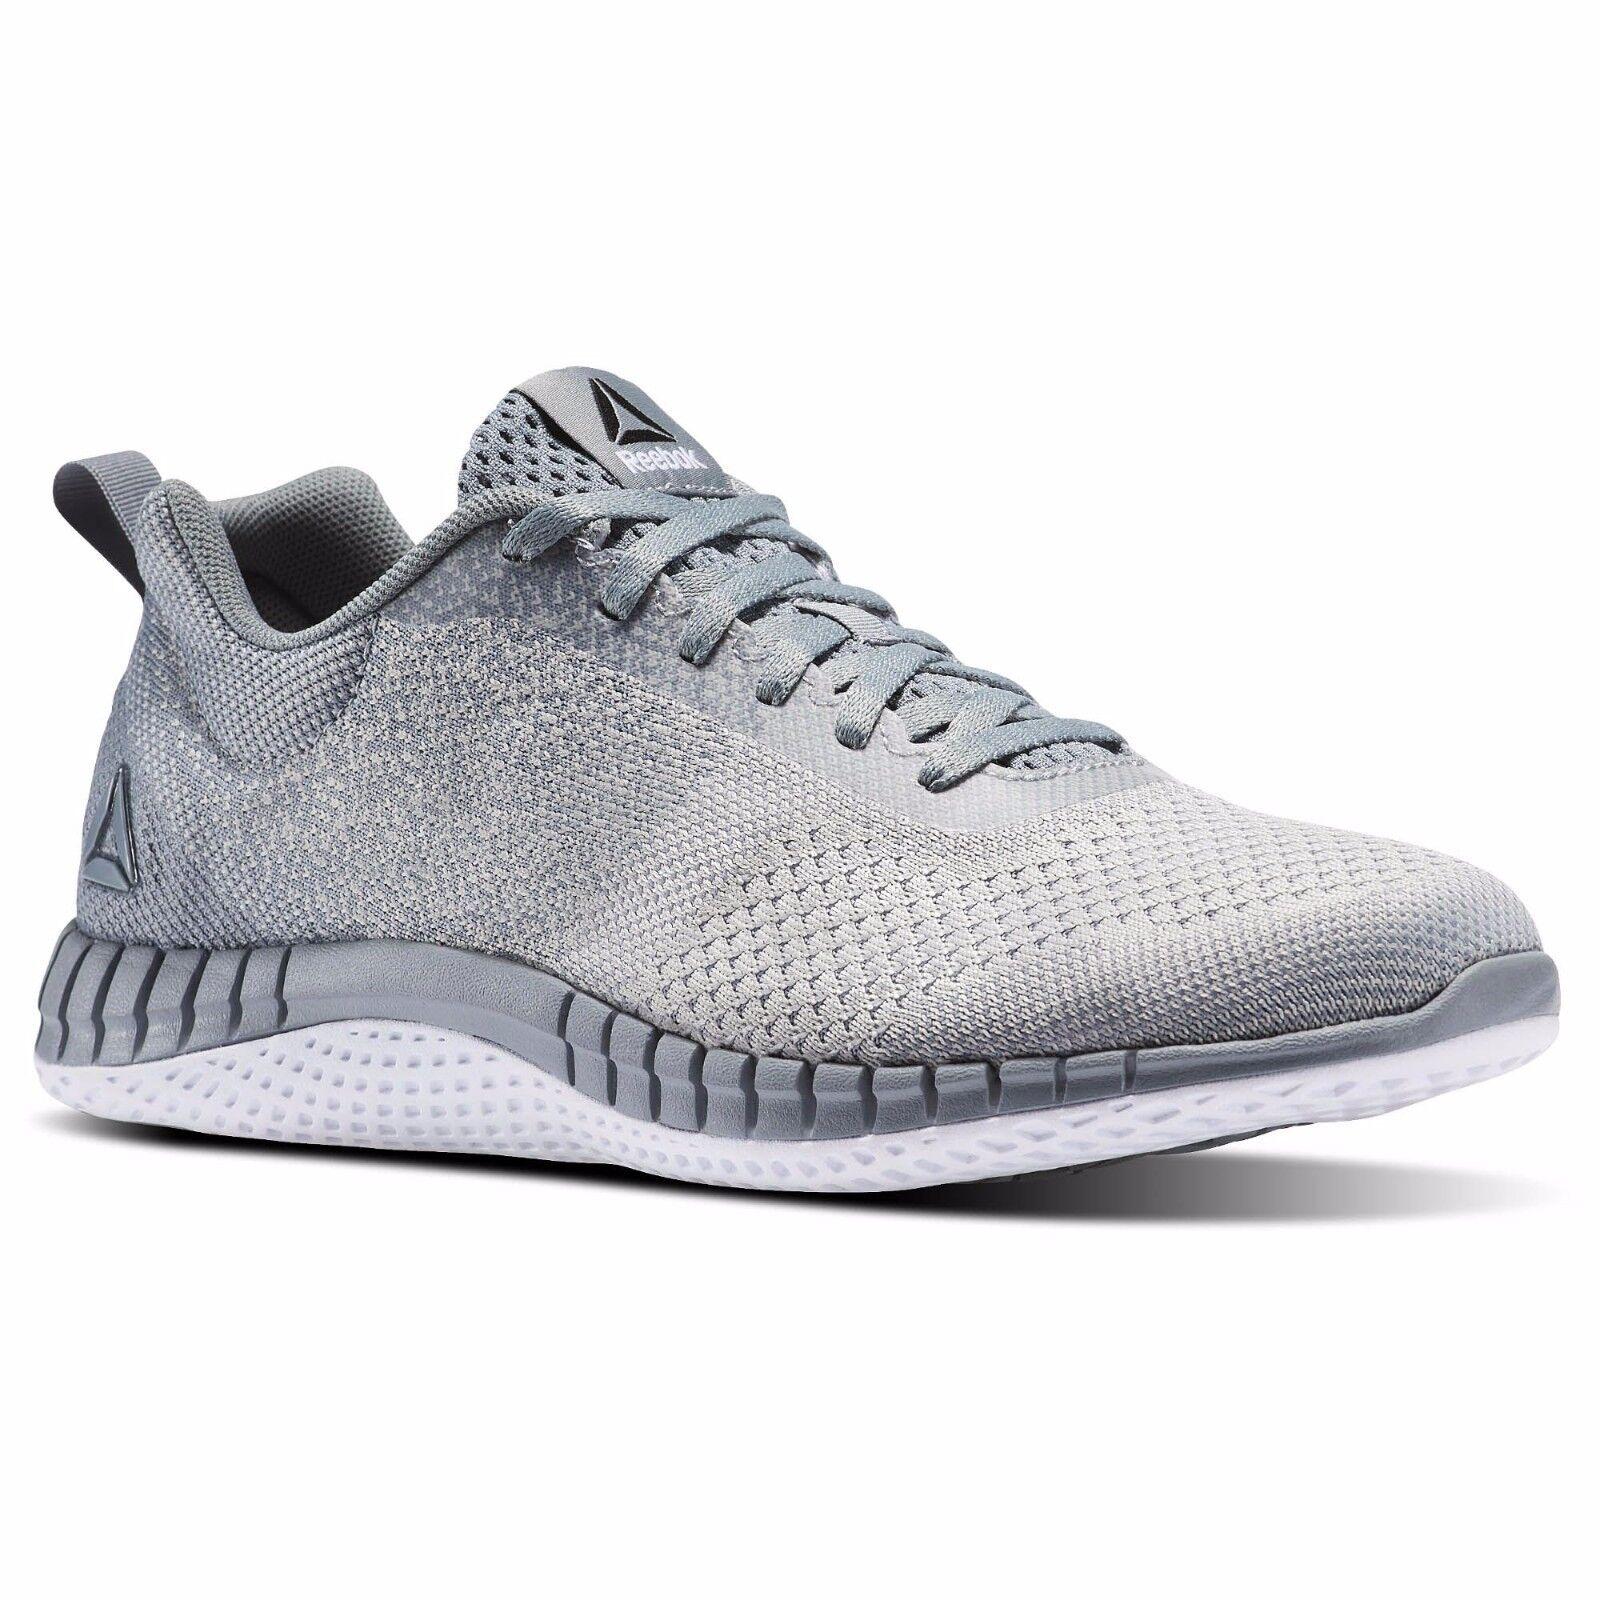 Reebok Print Run Prime BS6975 gris original Chaussures hommes